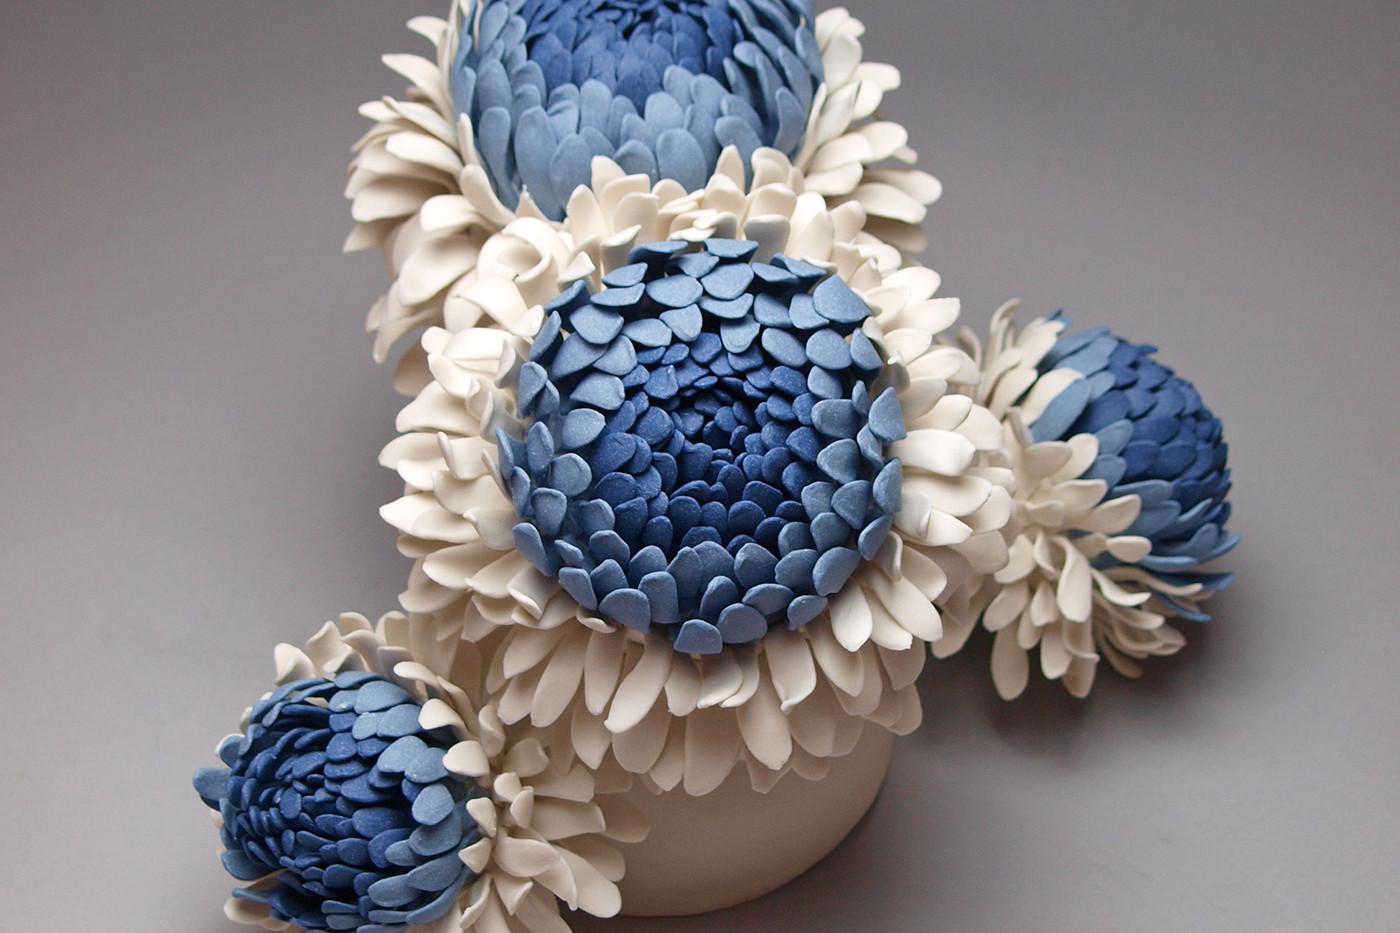 Porcelain flower sculpture